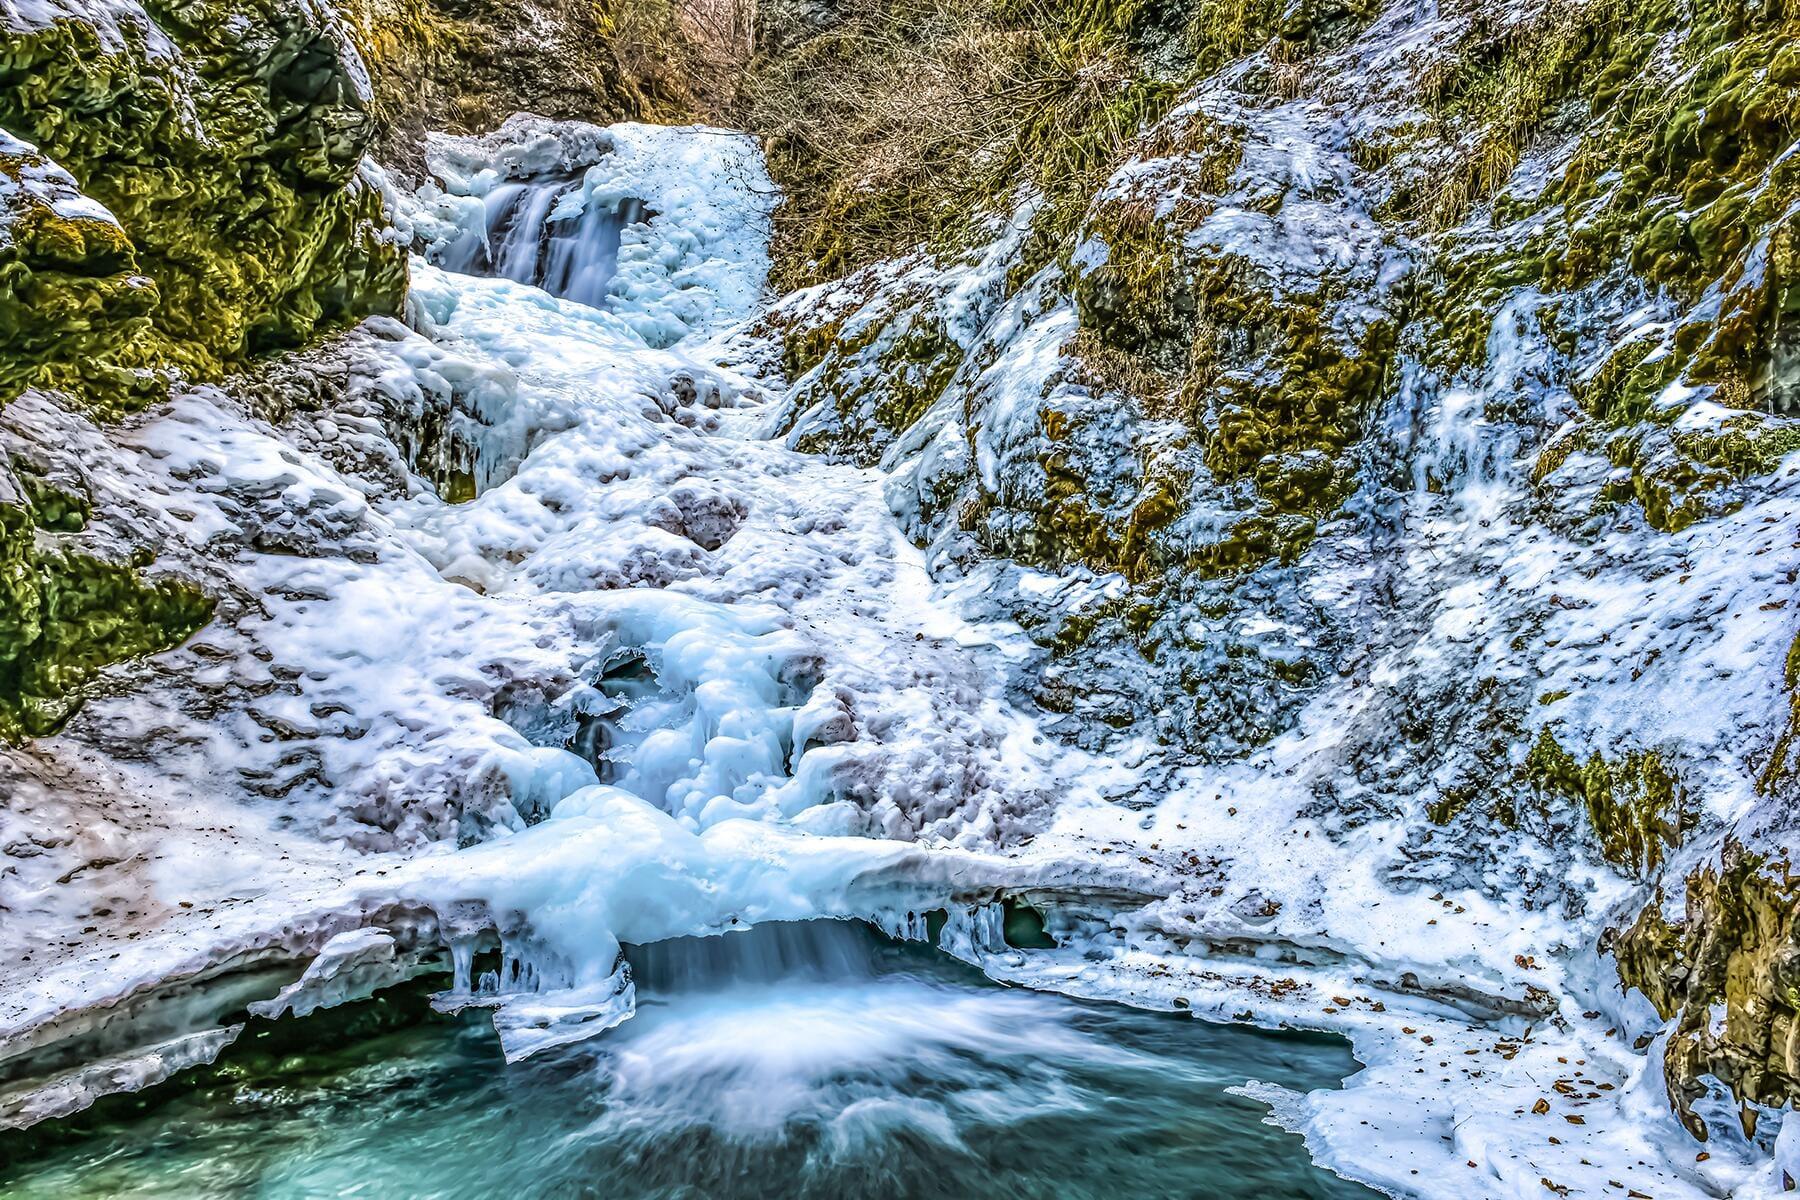 The 9 Best Frozen Waterfalls in North America